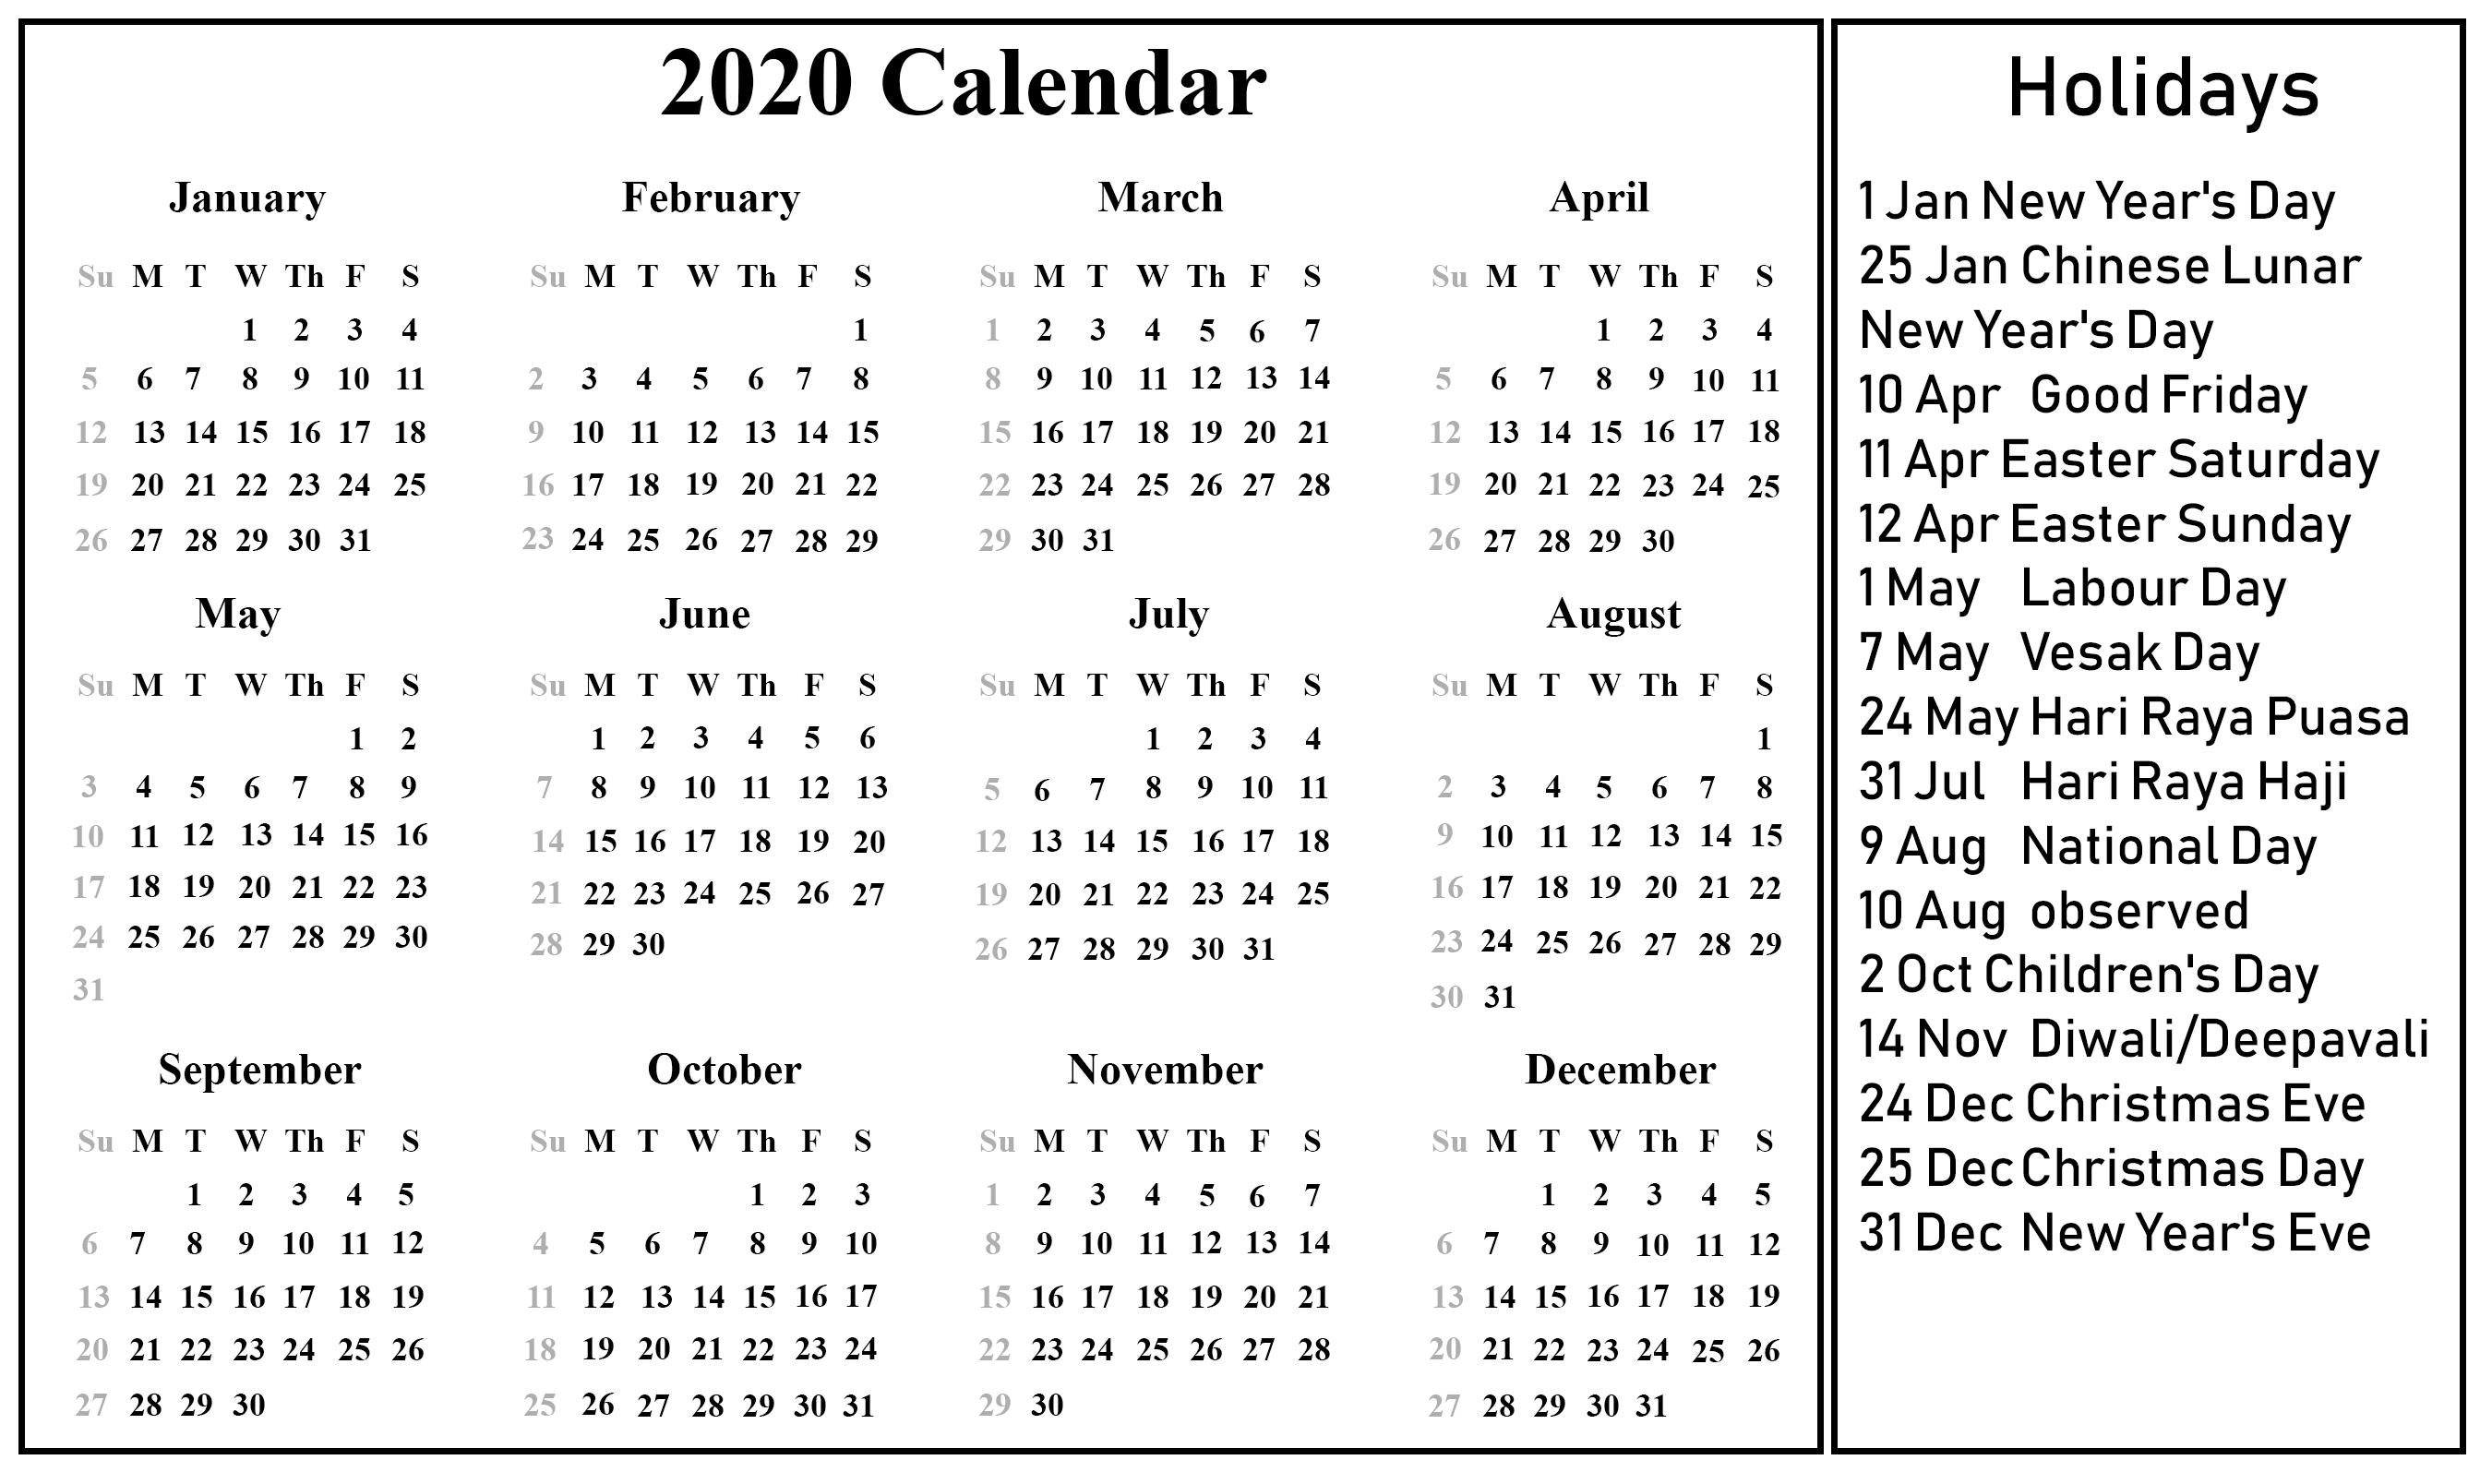 Singapore 2020 Printable Holidays Calendar | 2020 Calendars-2020 January Calendar Sri Lanka